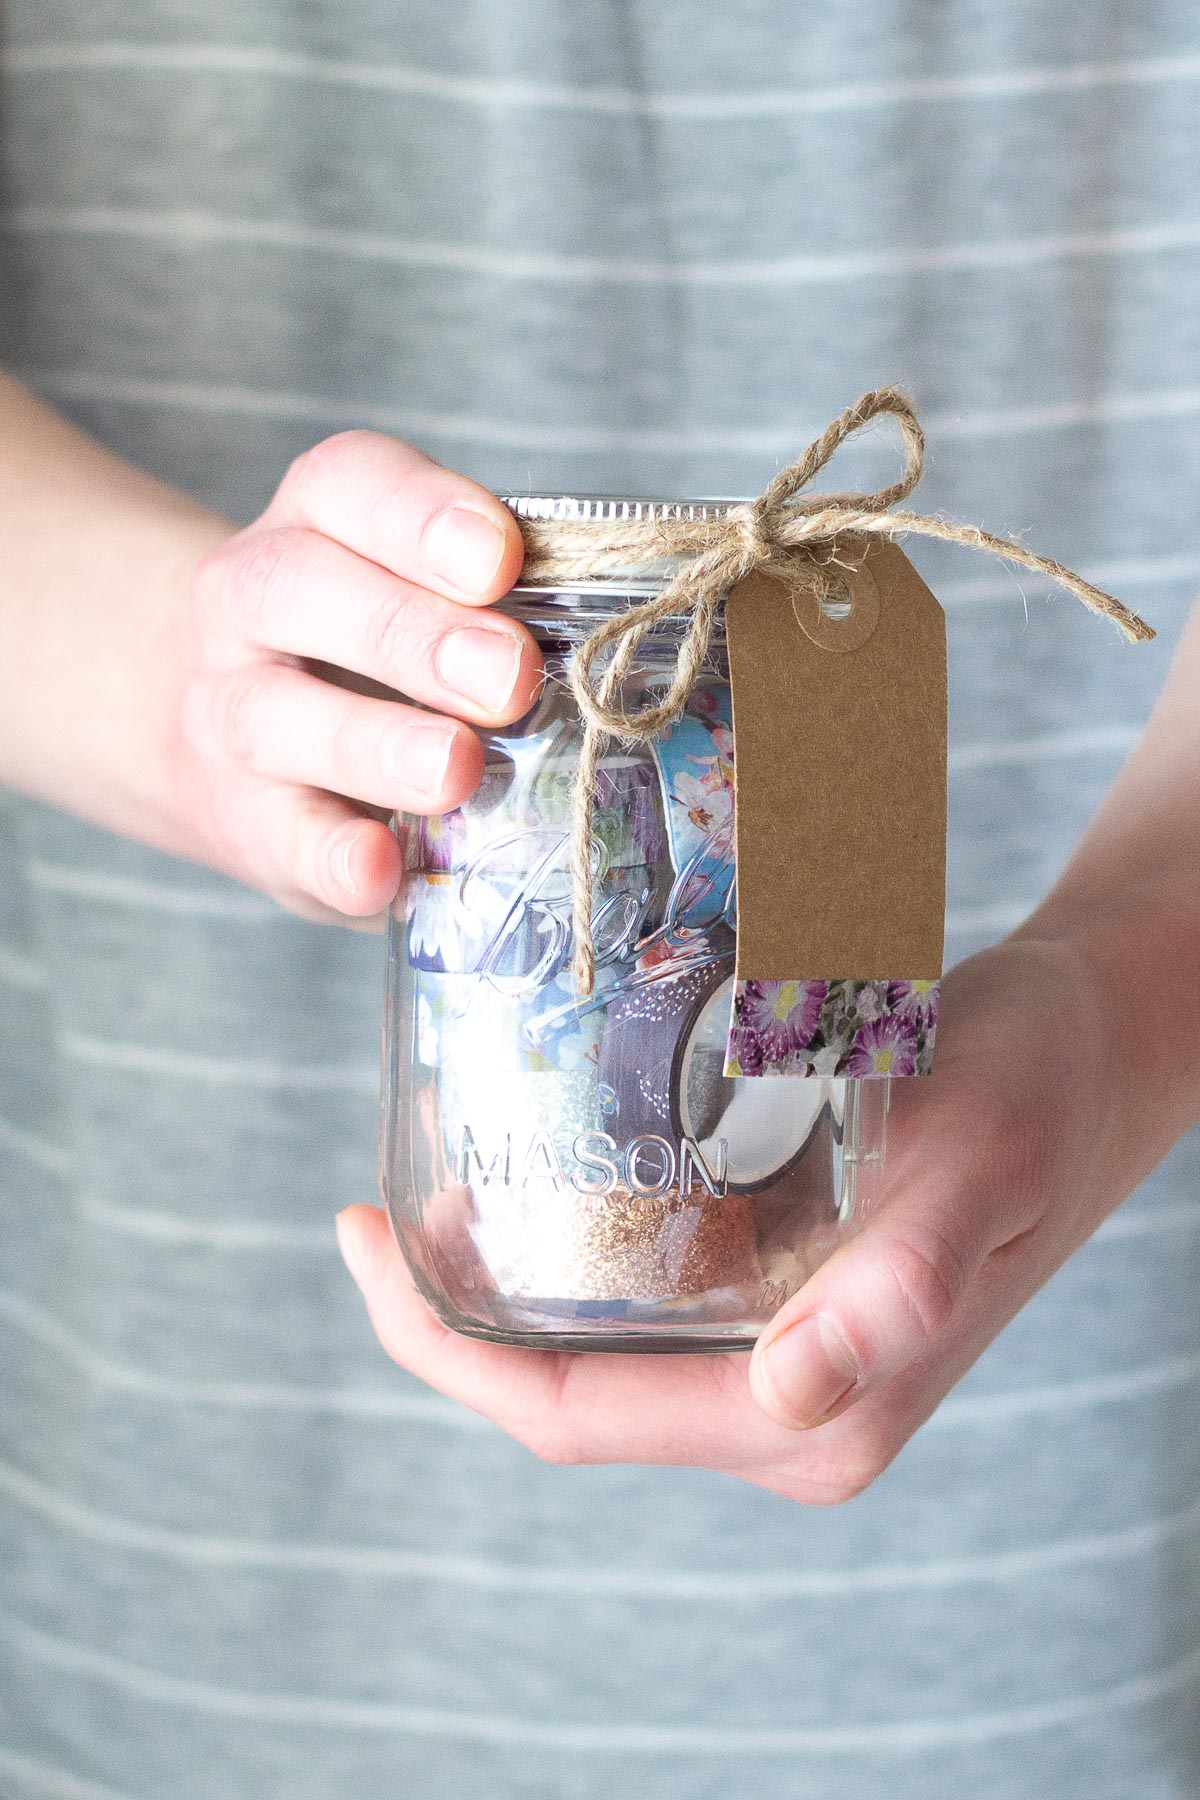 Holding a Washi Tape Mason Jar Gift Idea filled with colorful washi tape.